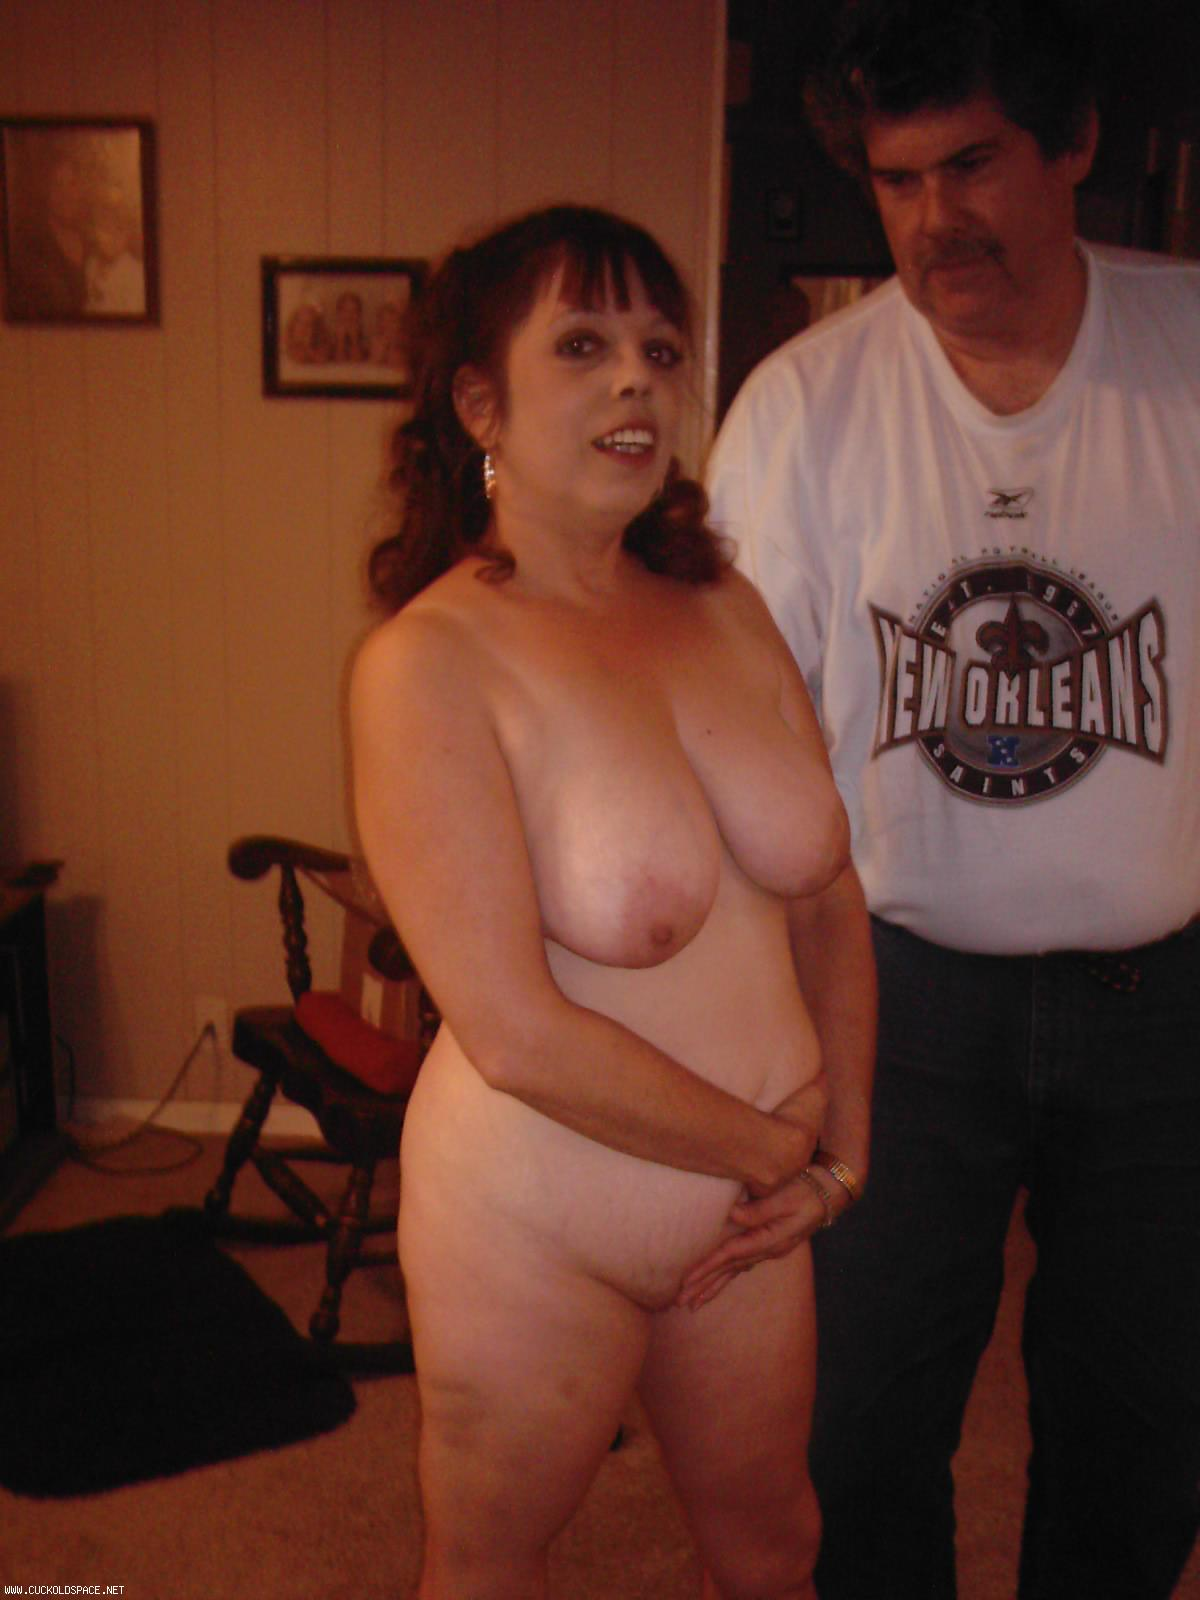 Las vegas cuckold - 4 1